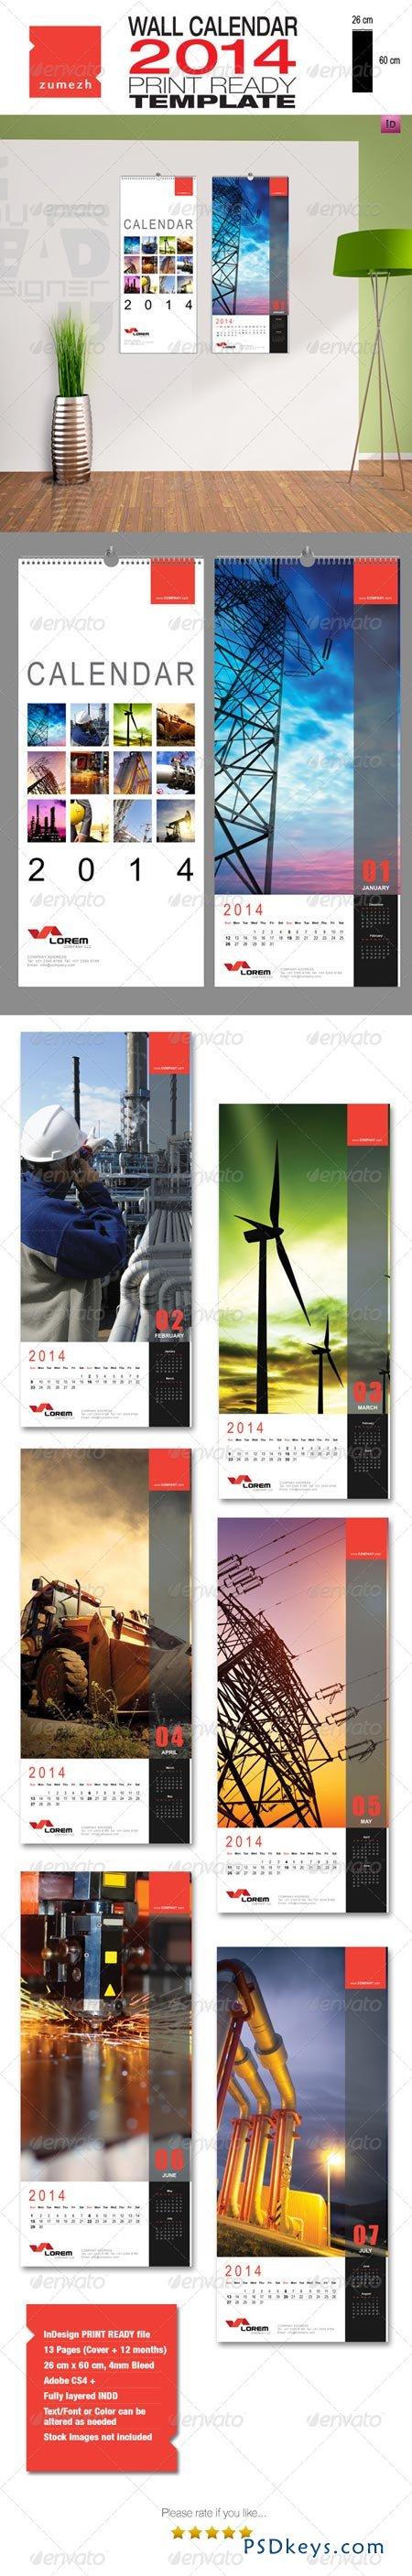 Corporate Wall Calendar 2014 - Portrait 6349479 » Free Download ...